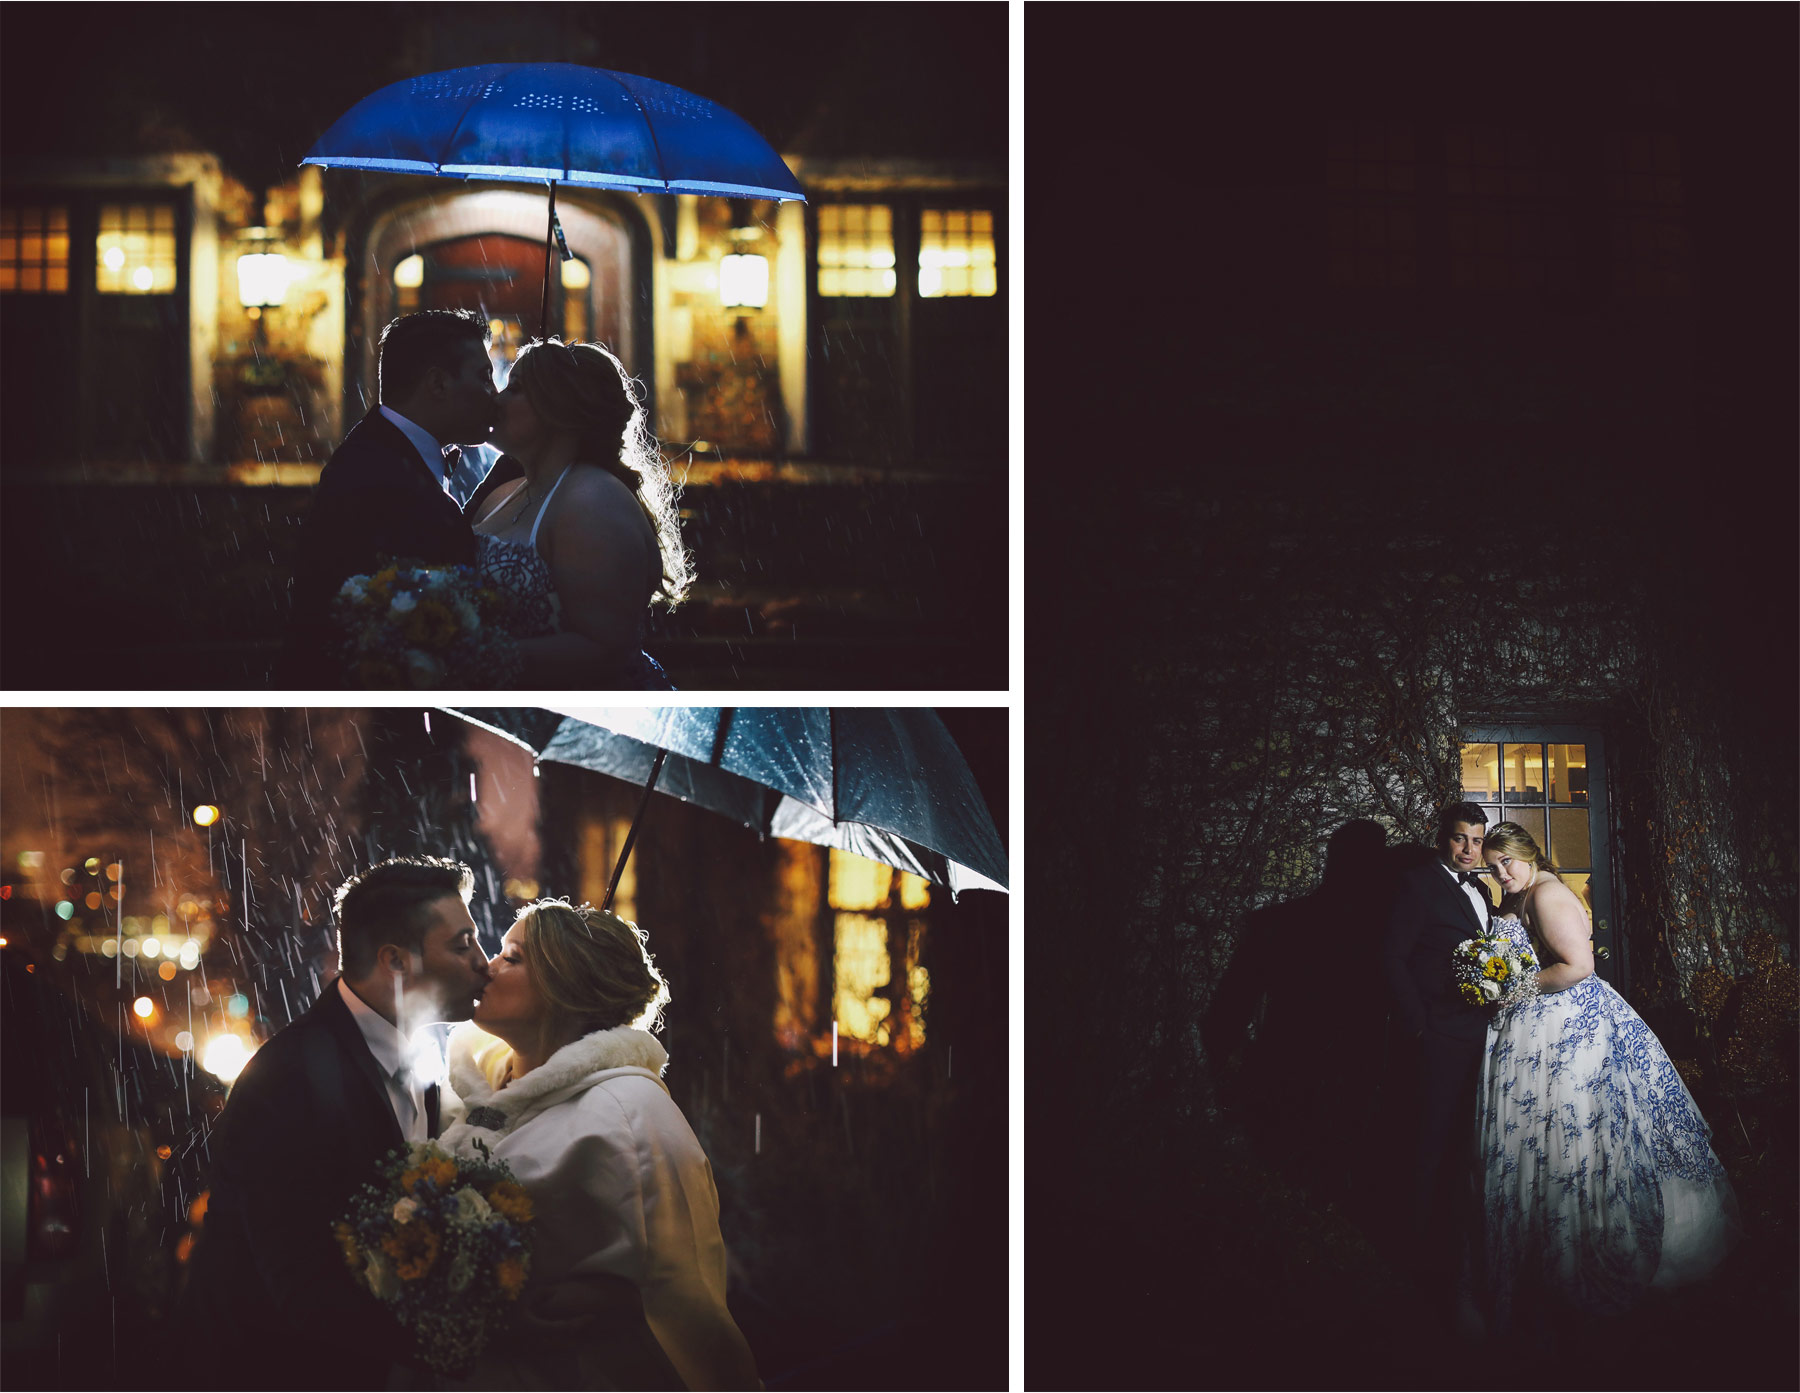 11-Saint-Paul-Minnesota-Wedding-Photography-by-Vick-Photography-The-University-Club-Night-Photography-Rain-Umbrella-Mari-and-Giuseppe.jpg